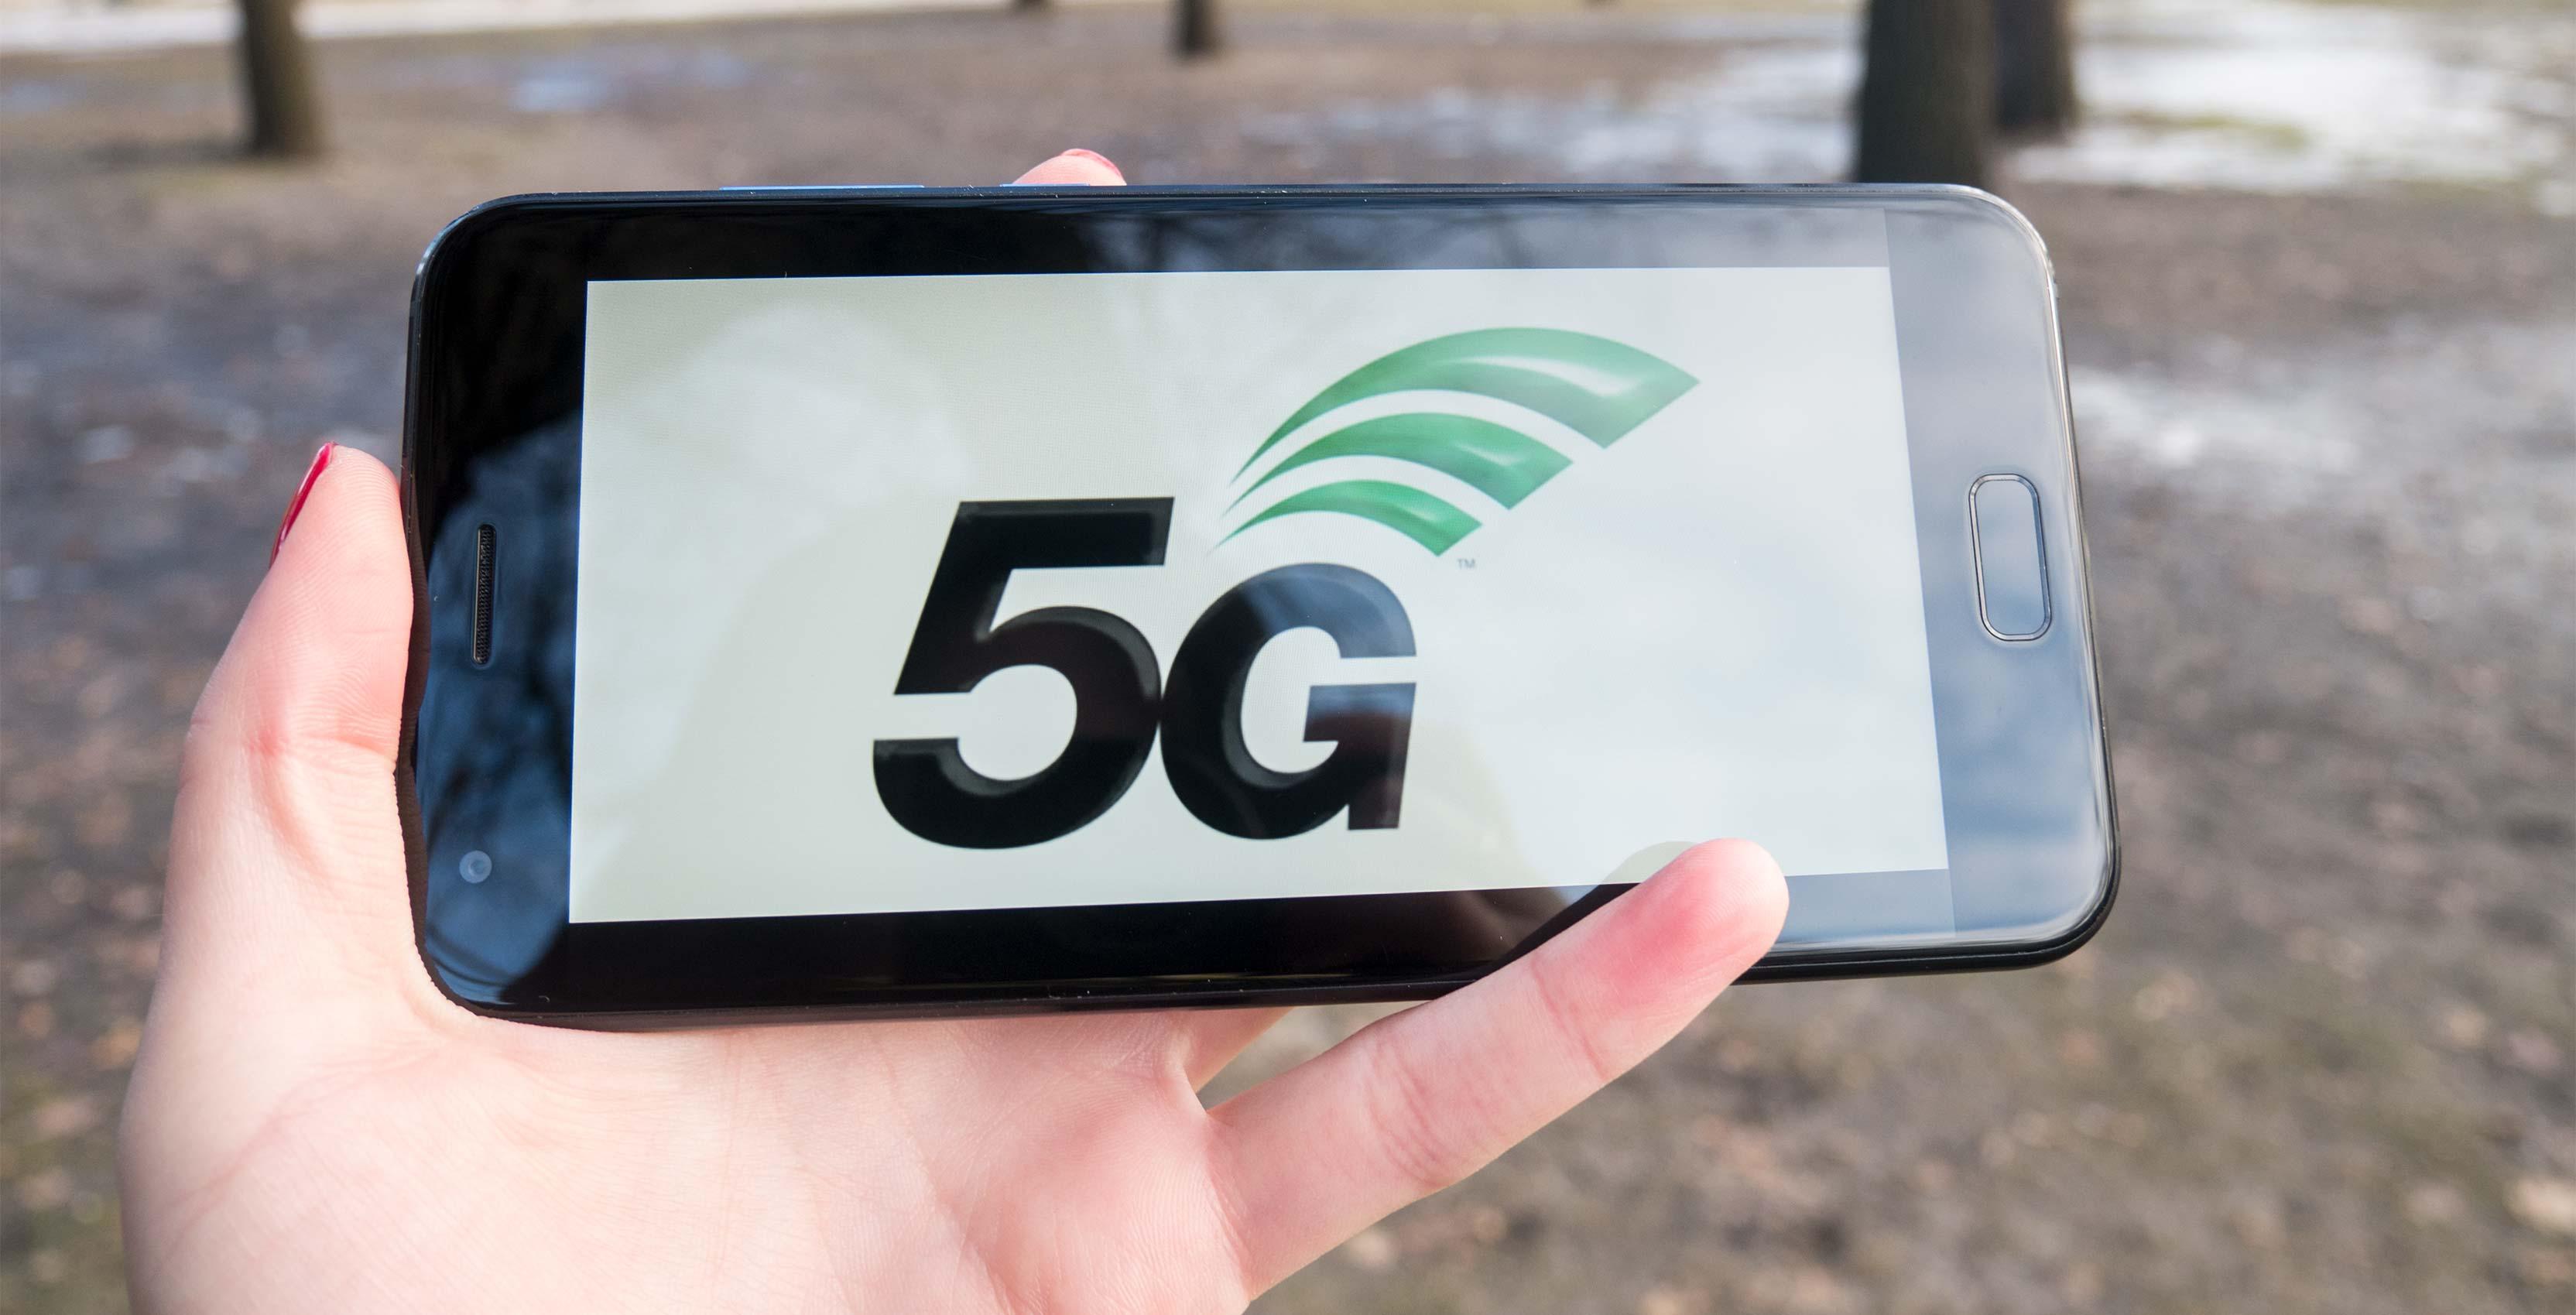 5G image on phone